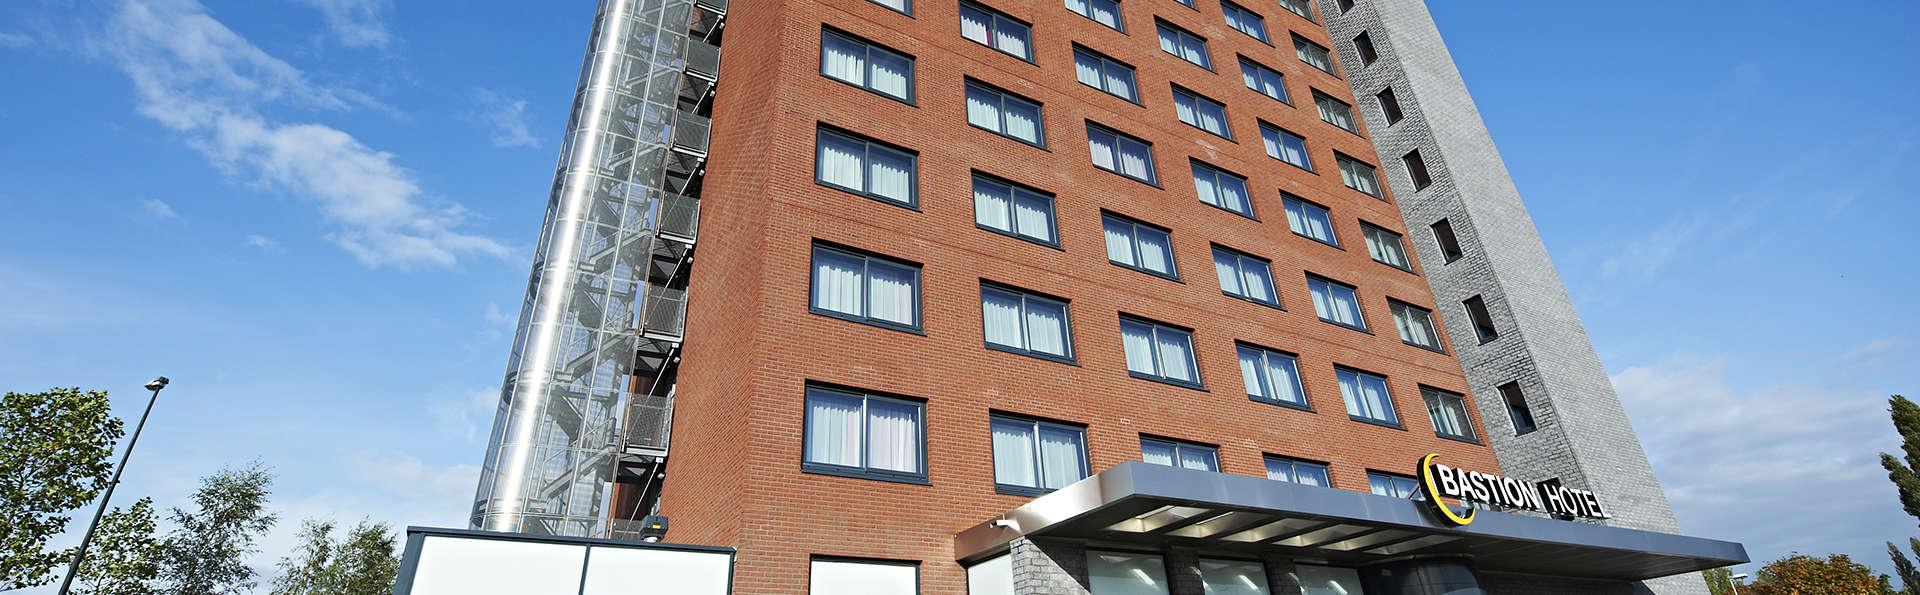 Bastion Hotel Vlaardingen - EDIT_Bastion_Hotel_Vlaardingen.jpg